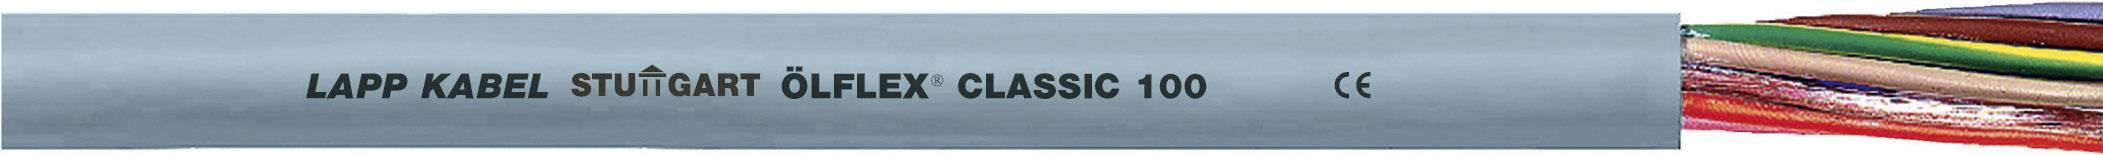 Kabel LappKabel Ölflex CLASSIC 100 12G1,5 (0010071), PVC, 12 mm, 500 V, šedá, 300 m